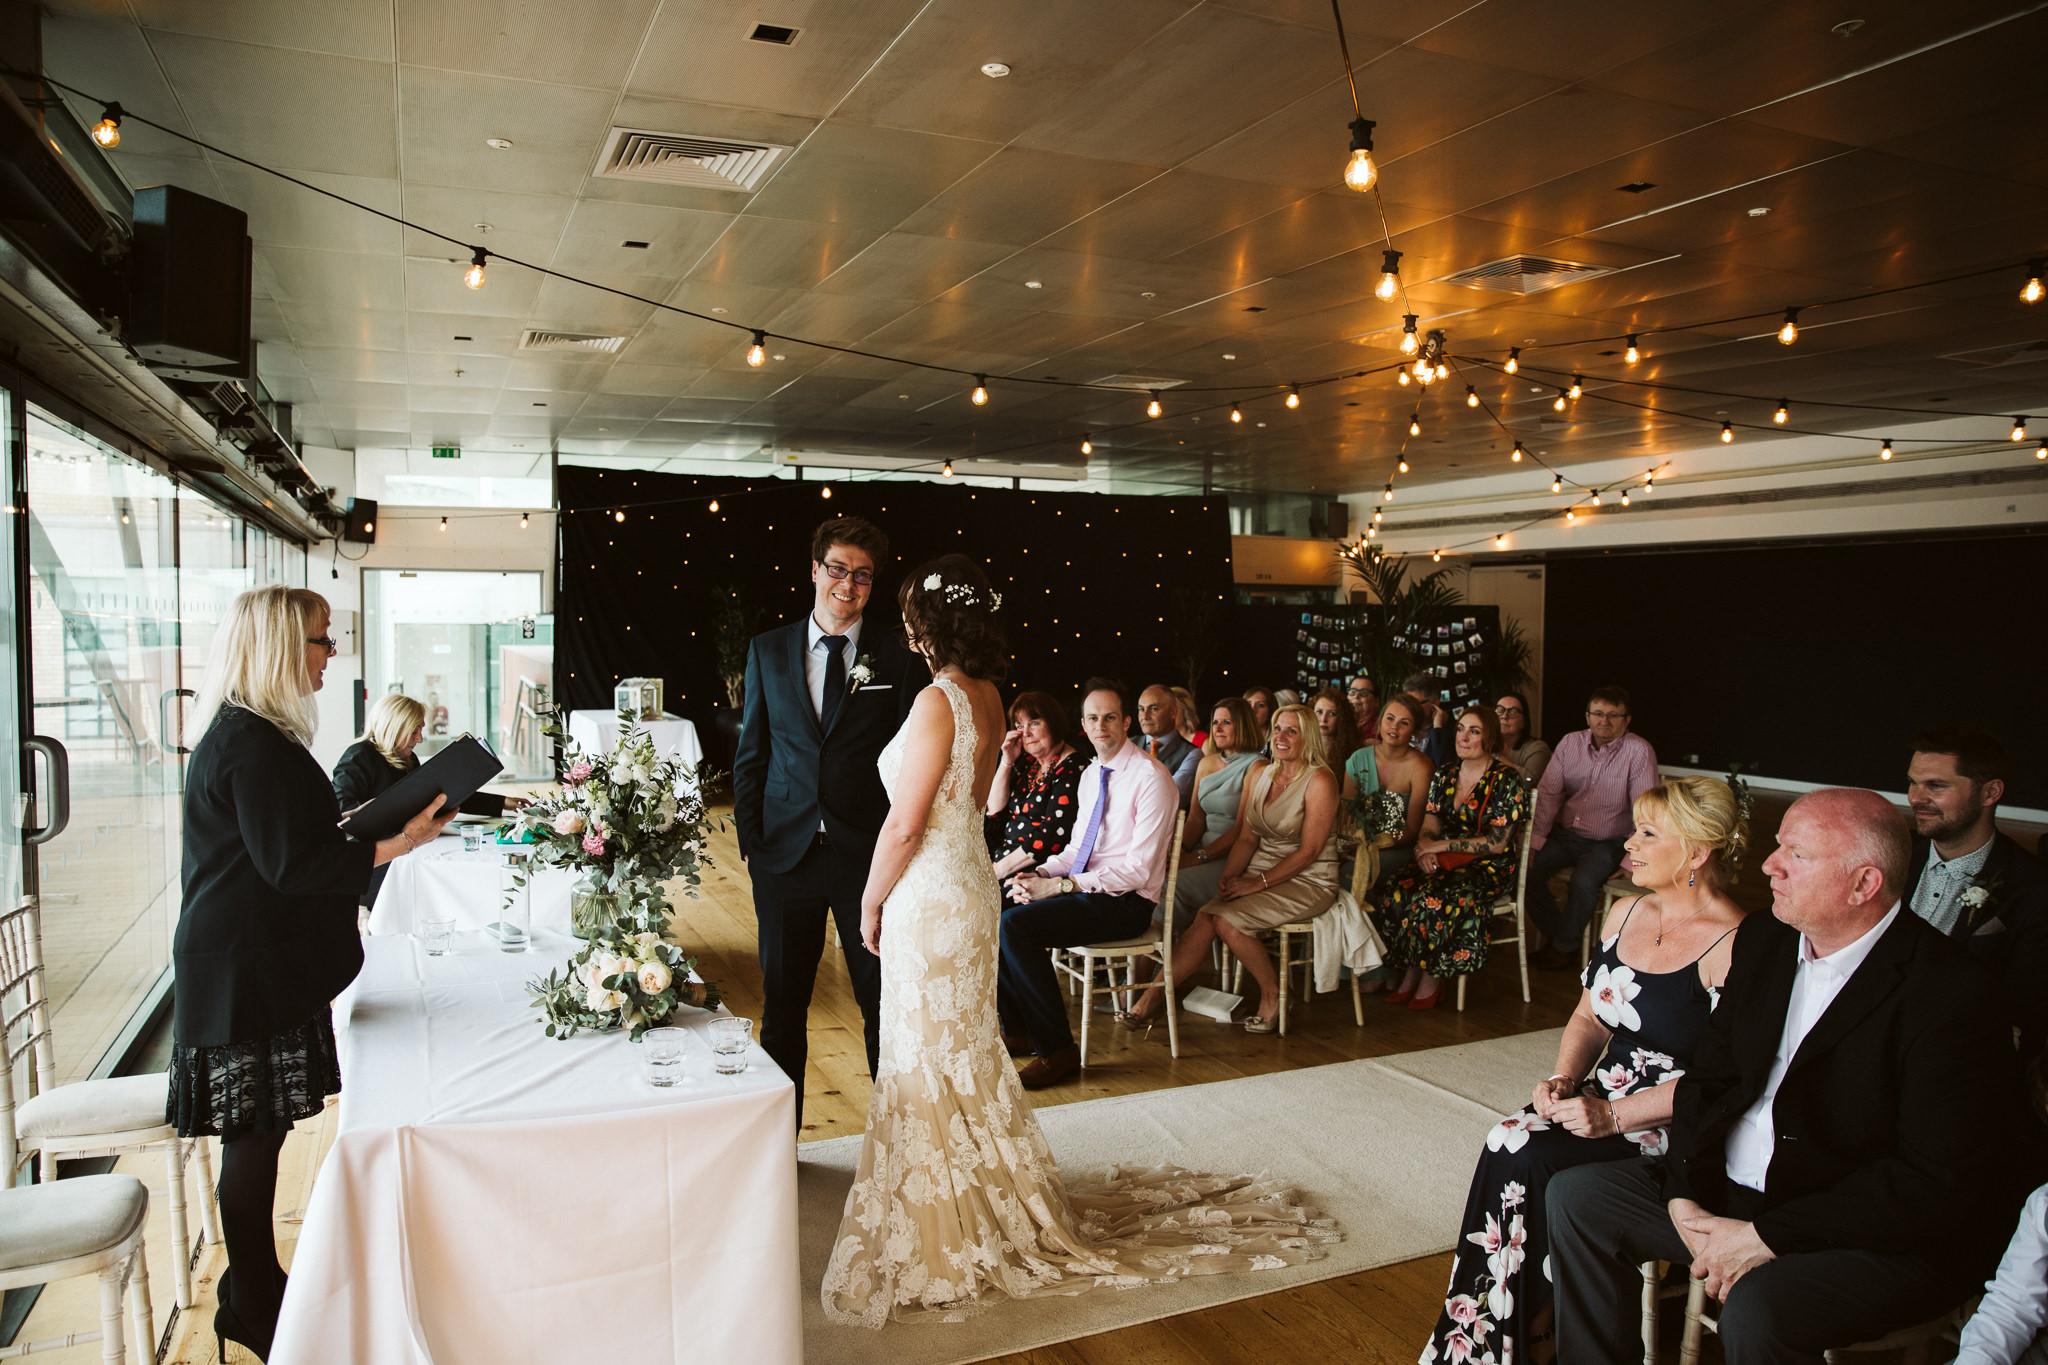 baltic-wedding-margarita-hope (23).jpg